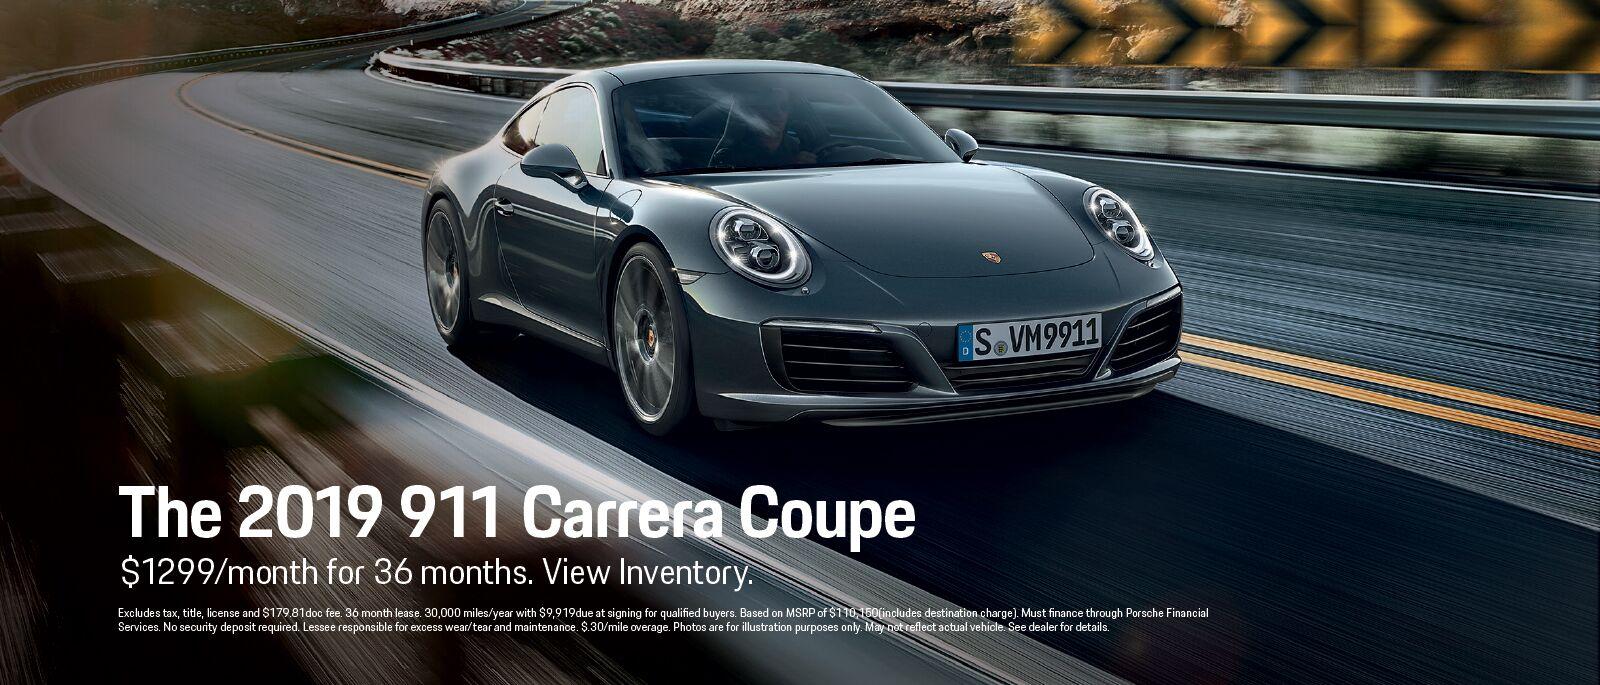 New Porsche 911 Carrerra Coupe|